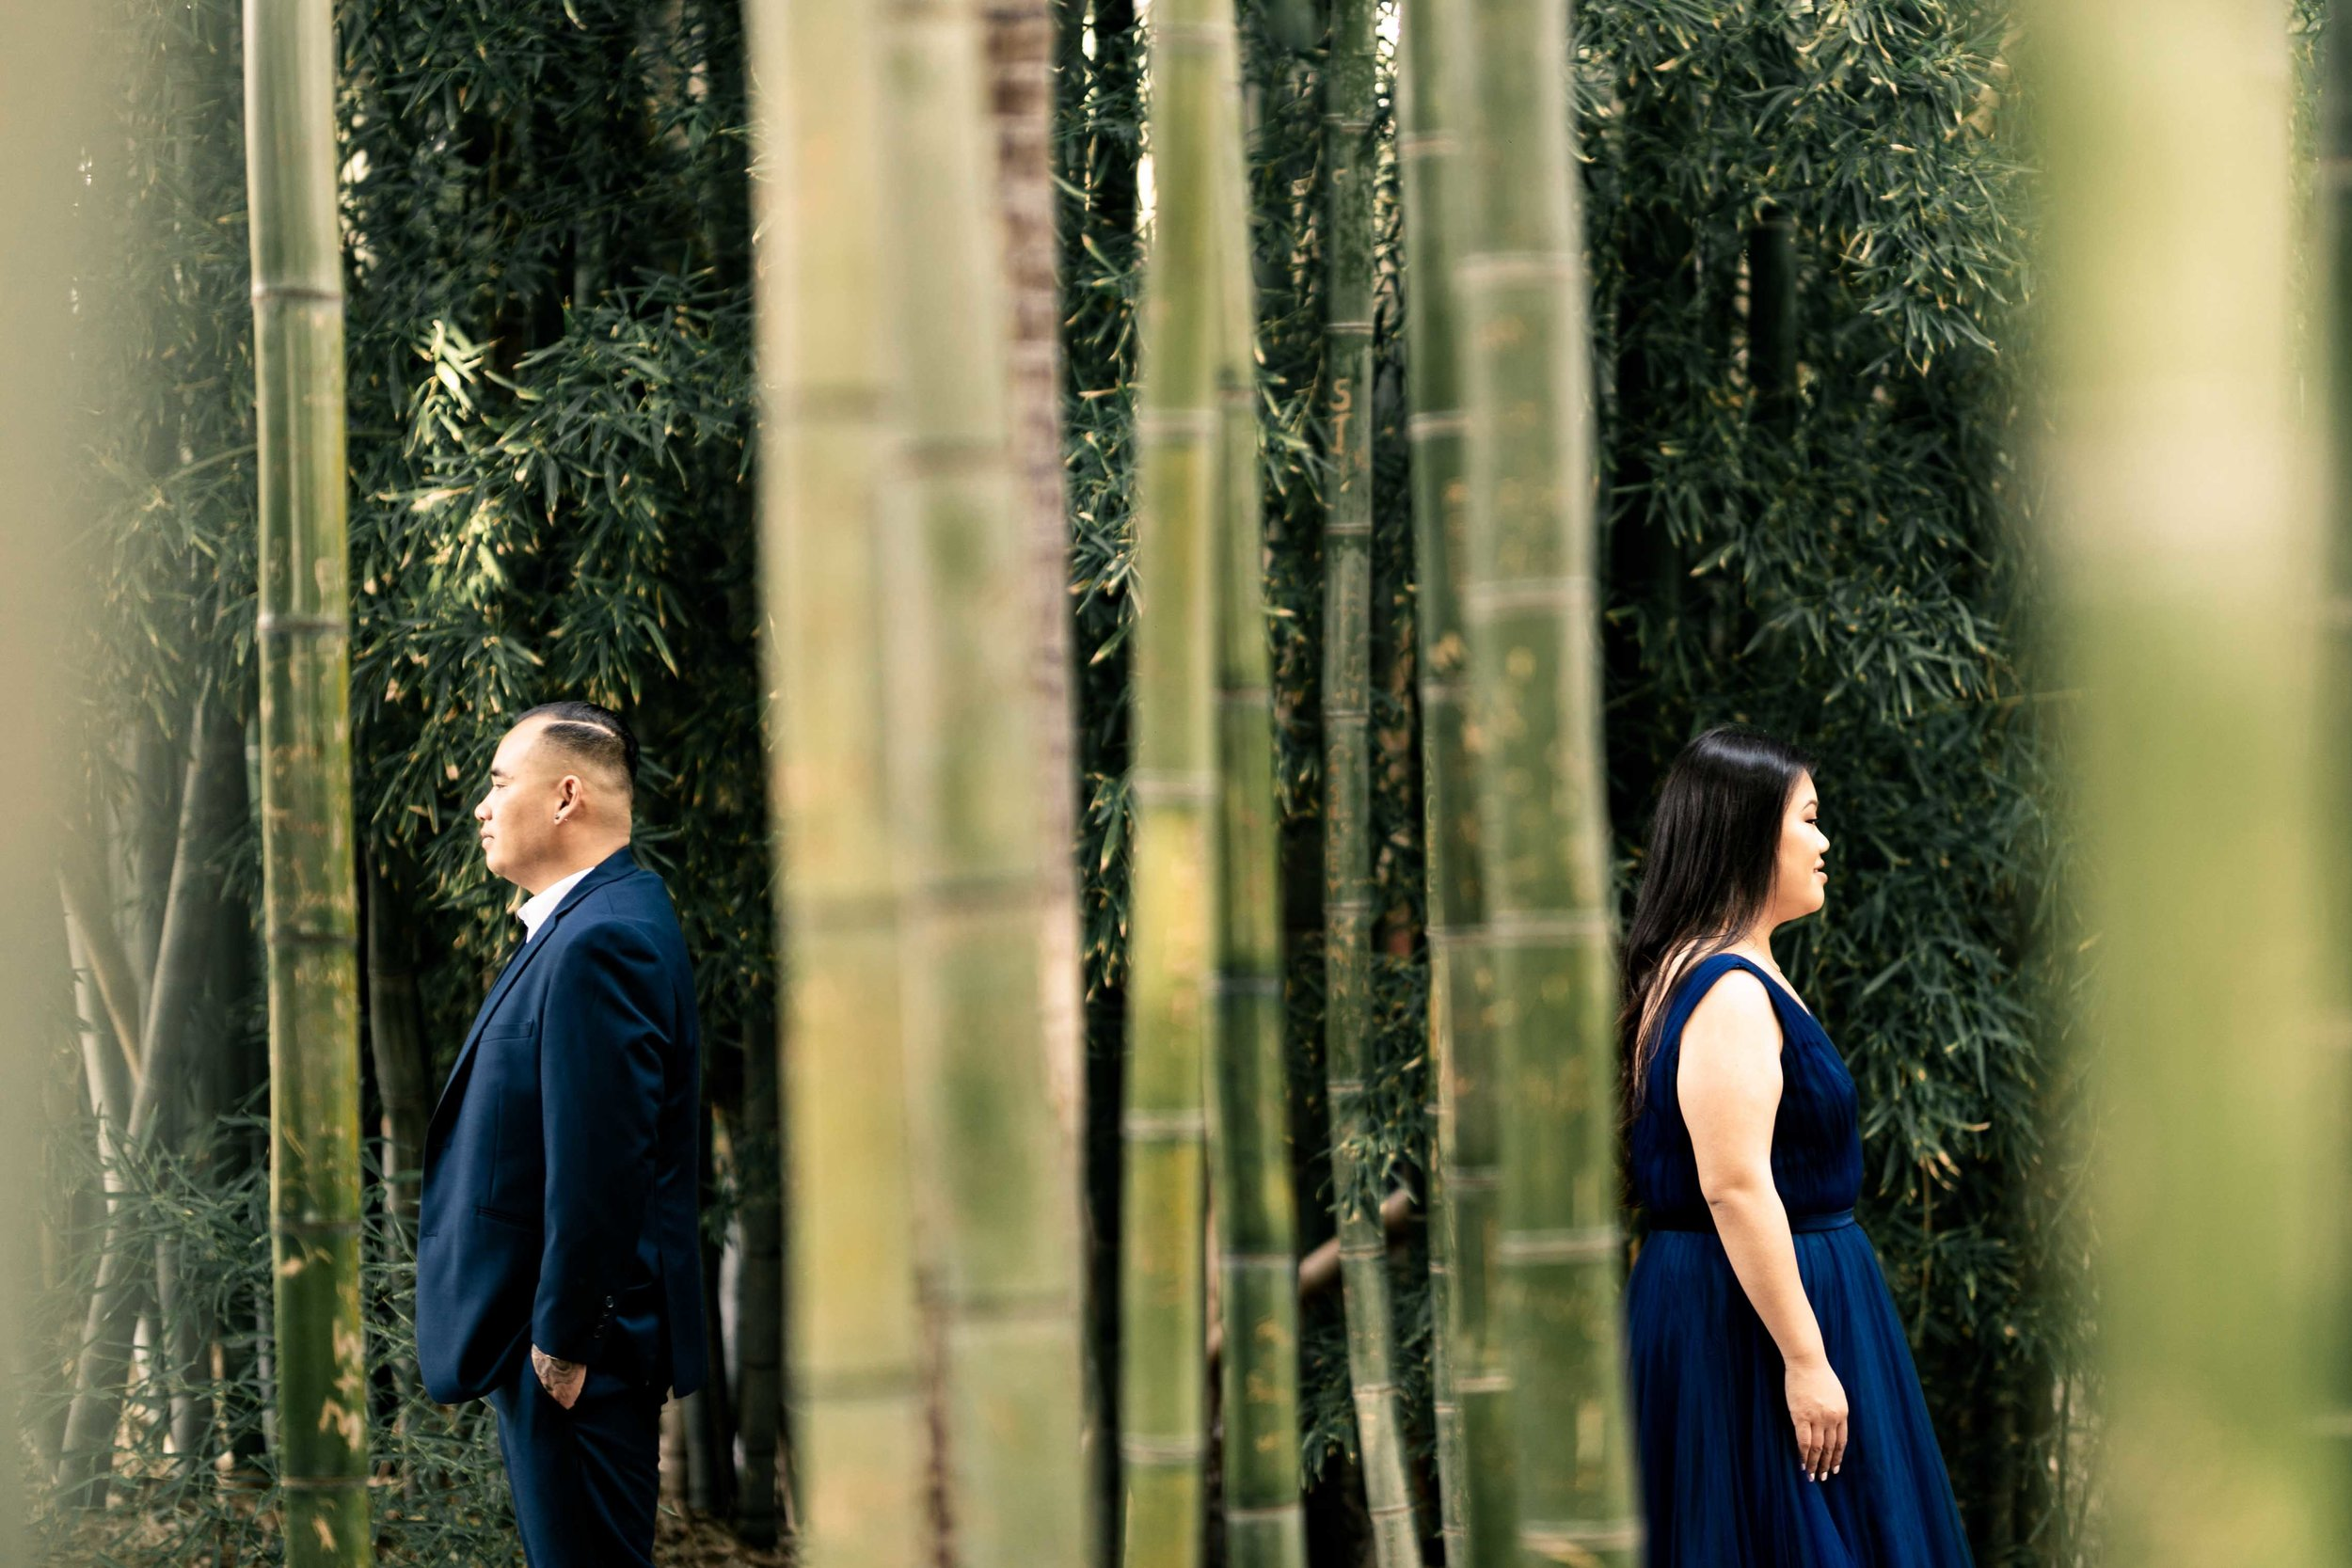 los_angeles_arboretum_engagement_joshuachun_photography_-13.JPG